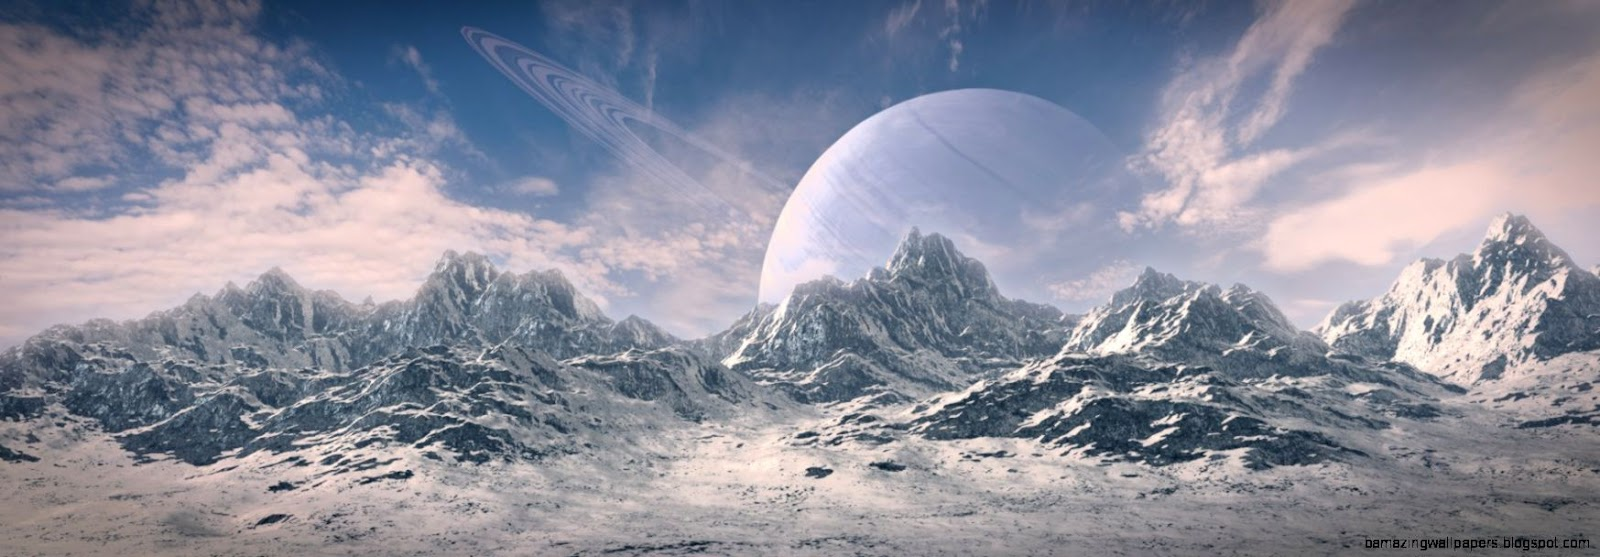 Alien Landscape Amazing Wallpapers